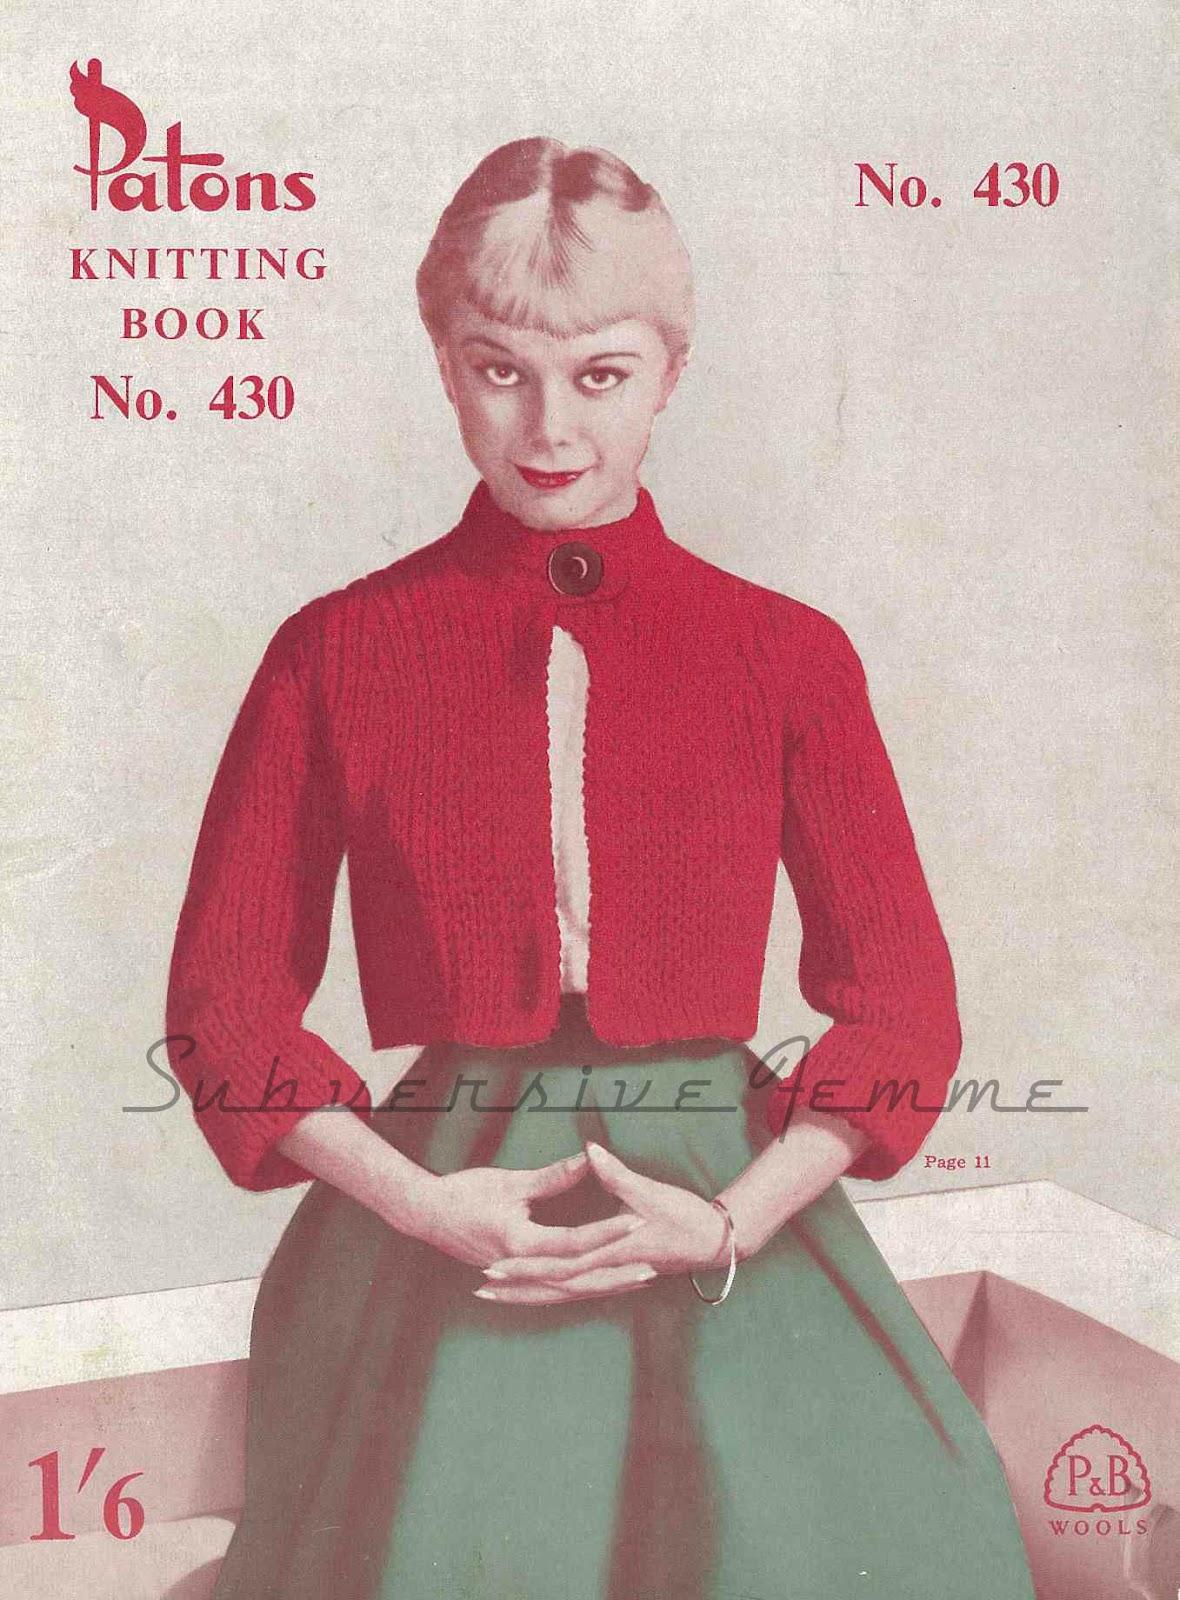 Nautical Shortie Coat from Patons No.430, 1950s – Subversive Femme